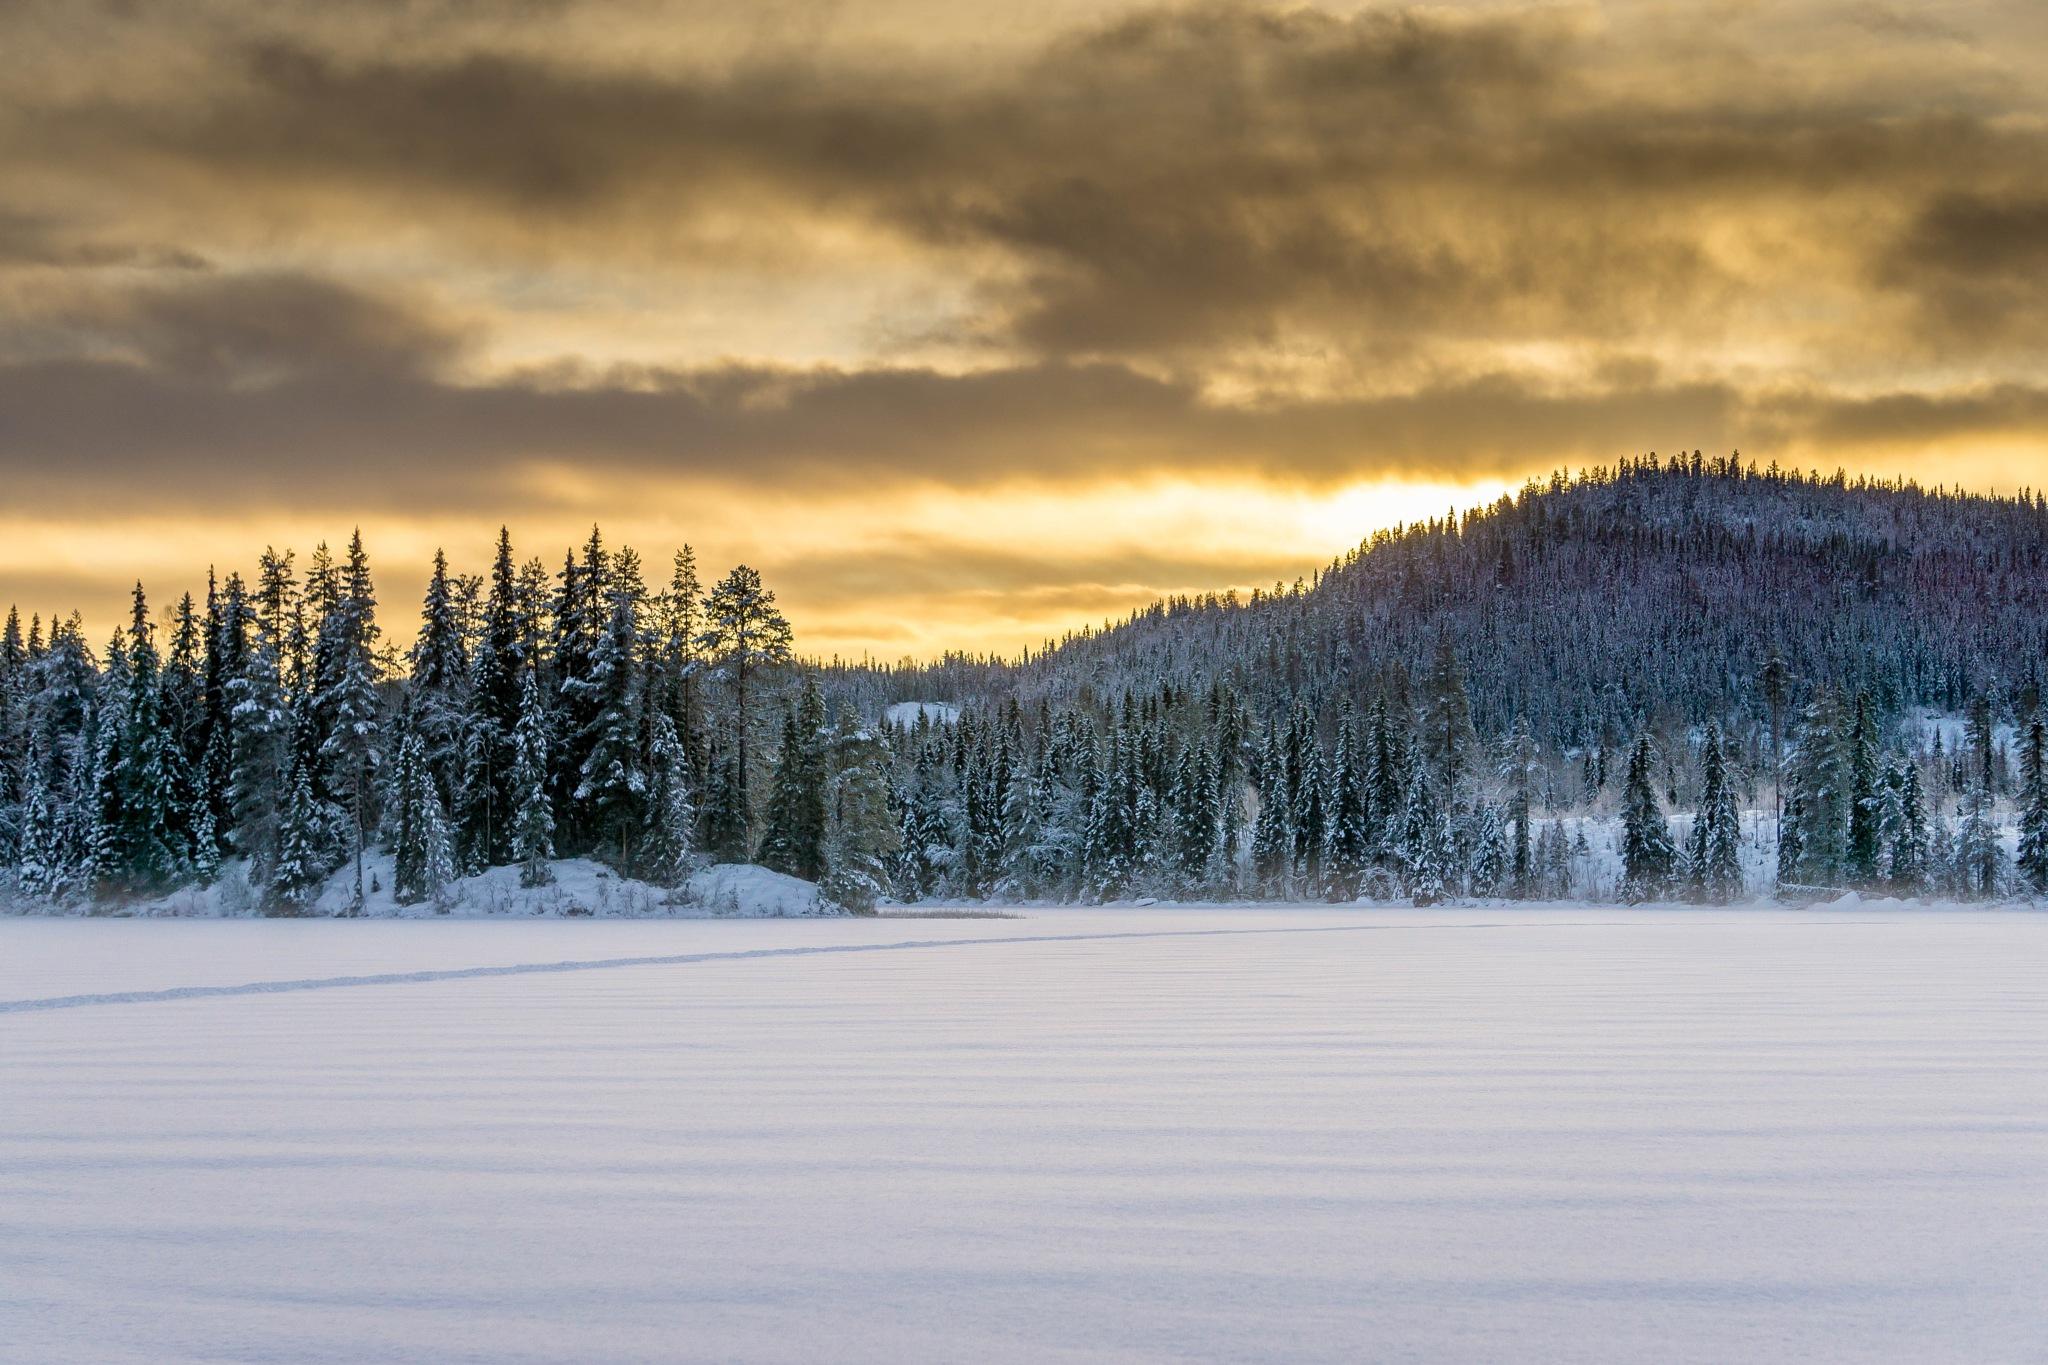 A short day by Carl Göran Olsson